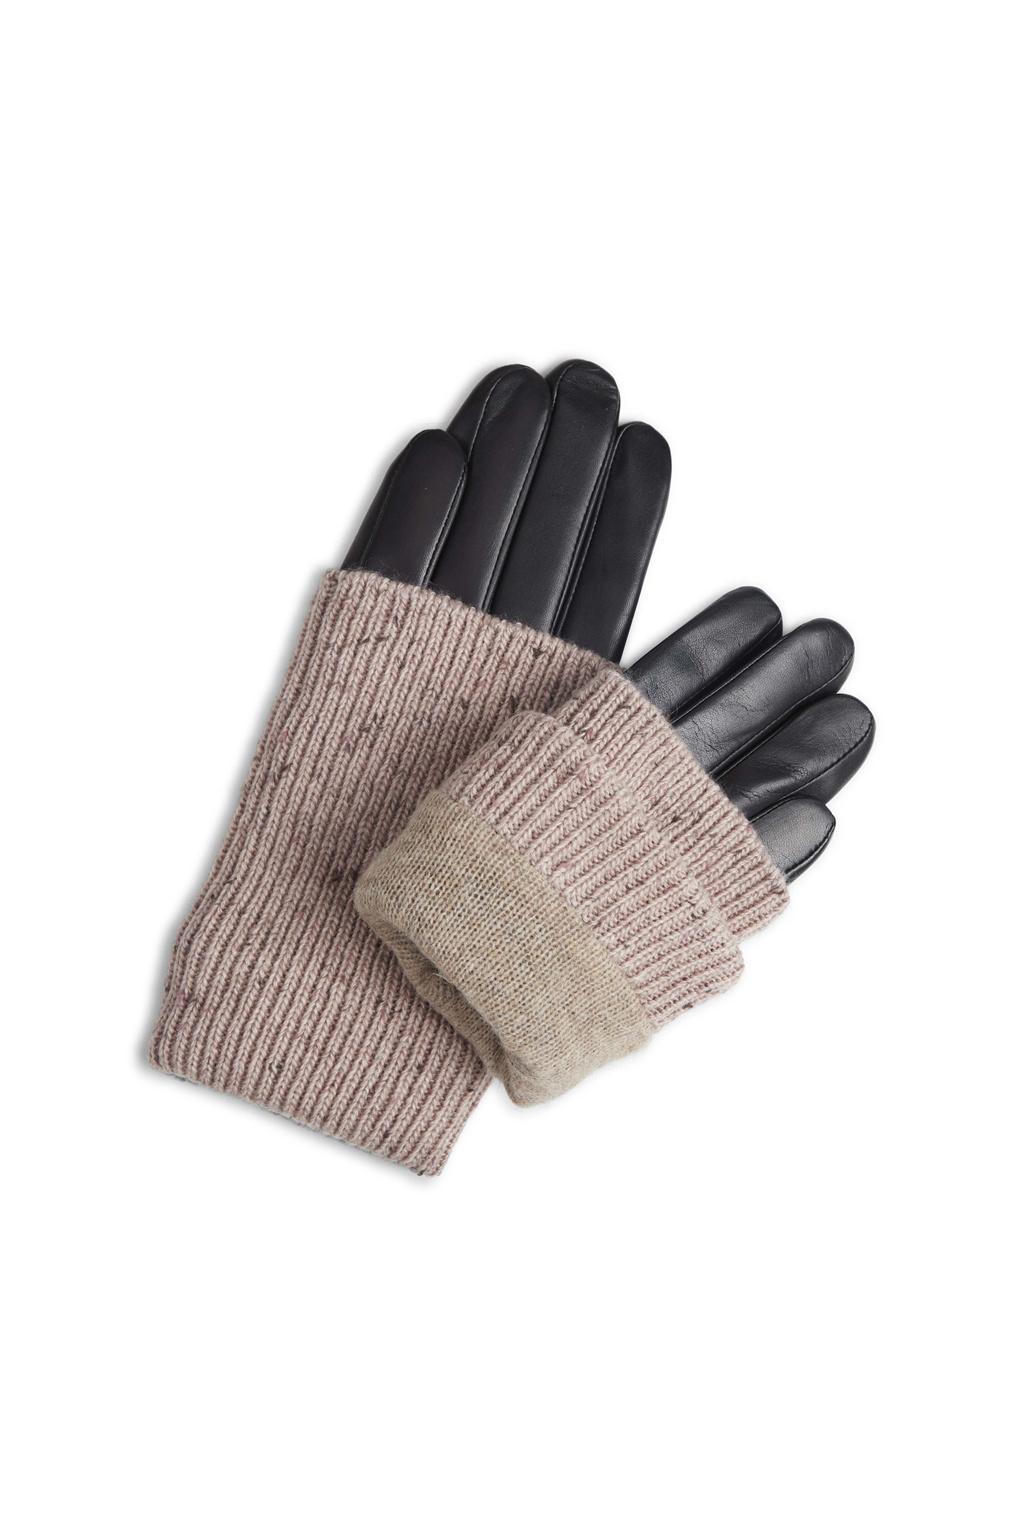 Helly Glove - Black w/ Mix Earth-3